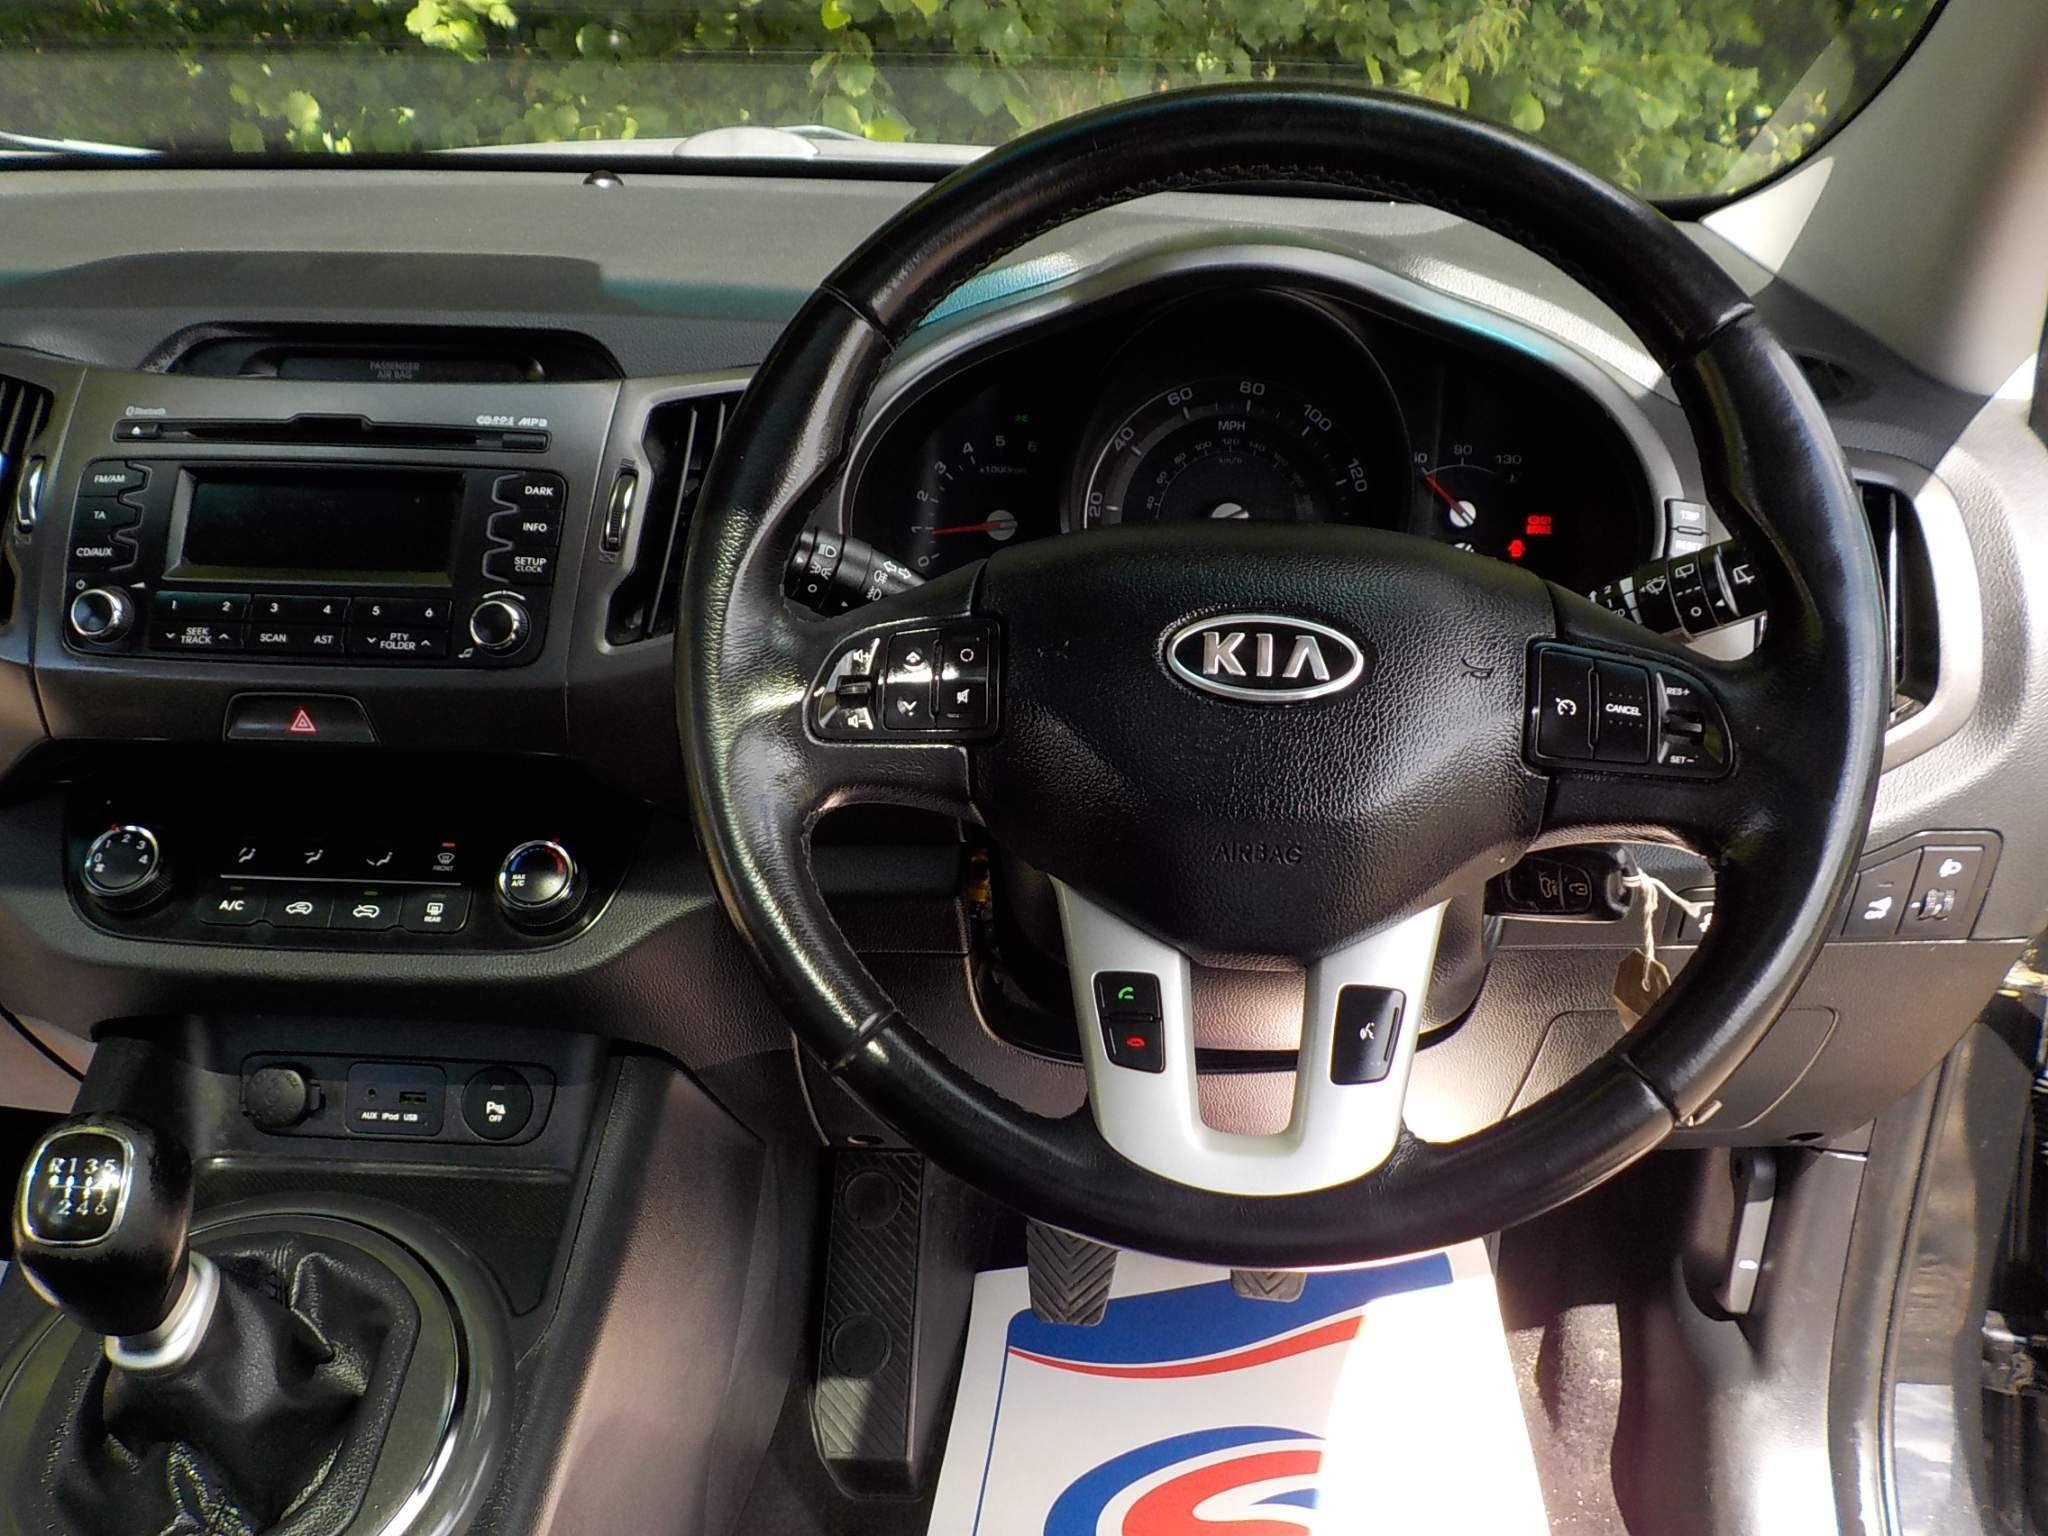 Kia Sportage 1.7 CRDi 2 2WD 5dr